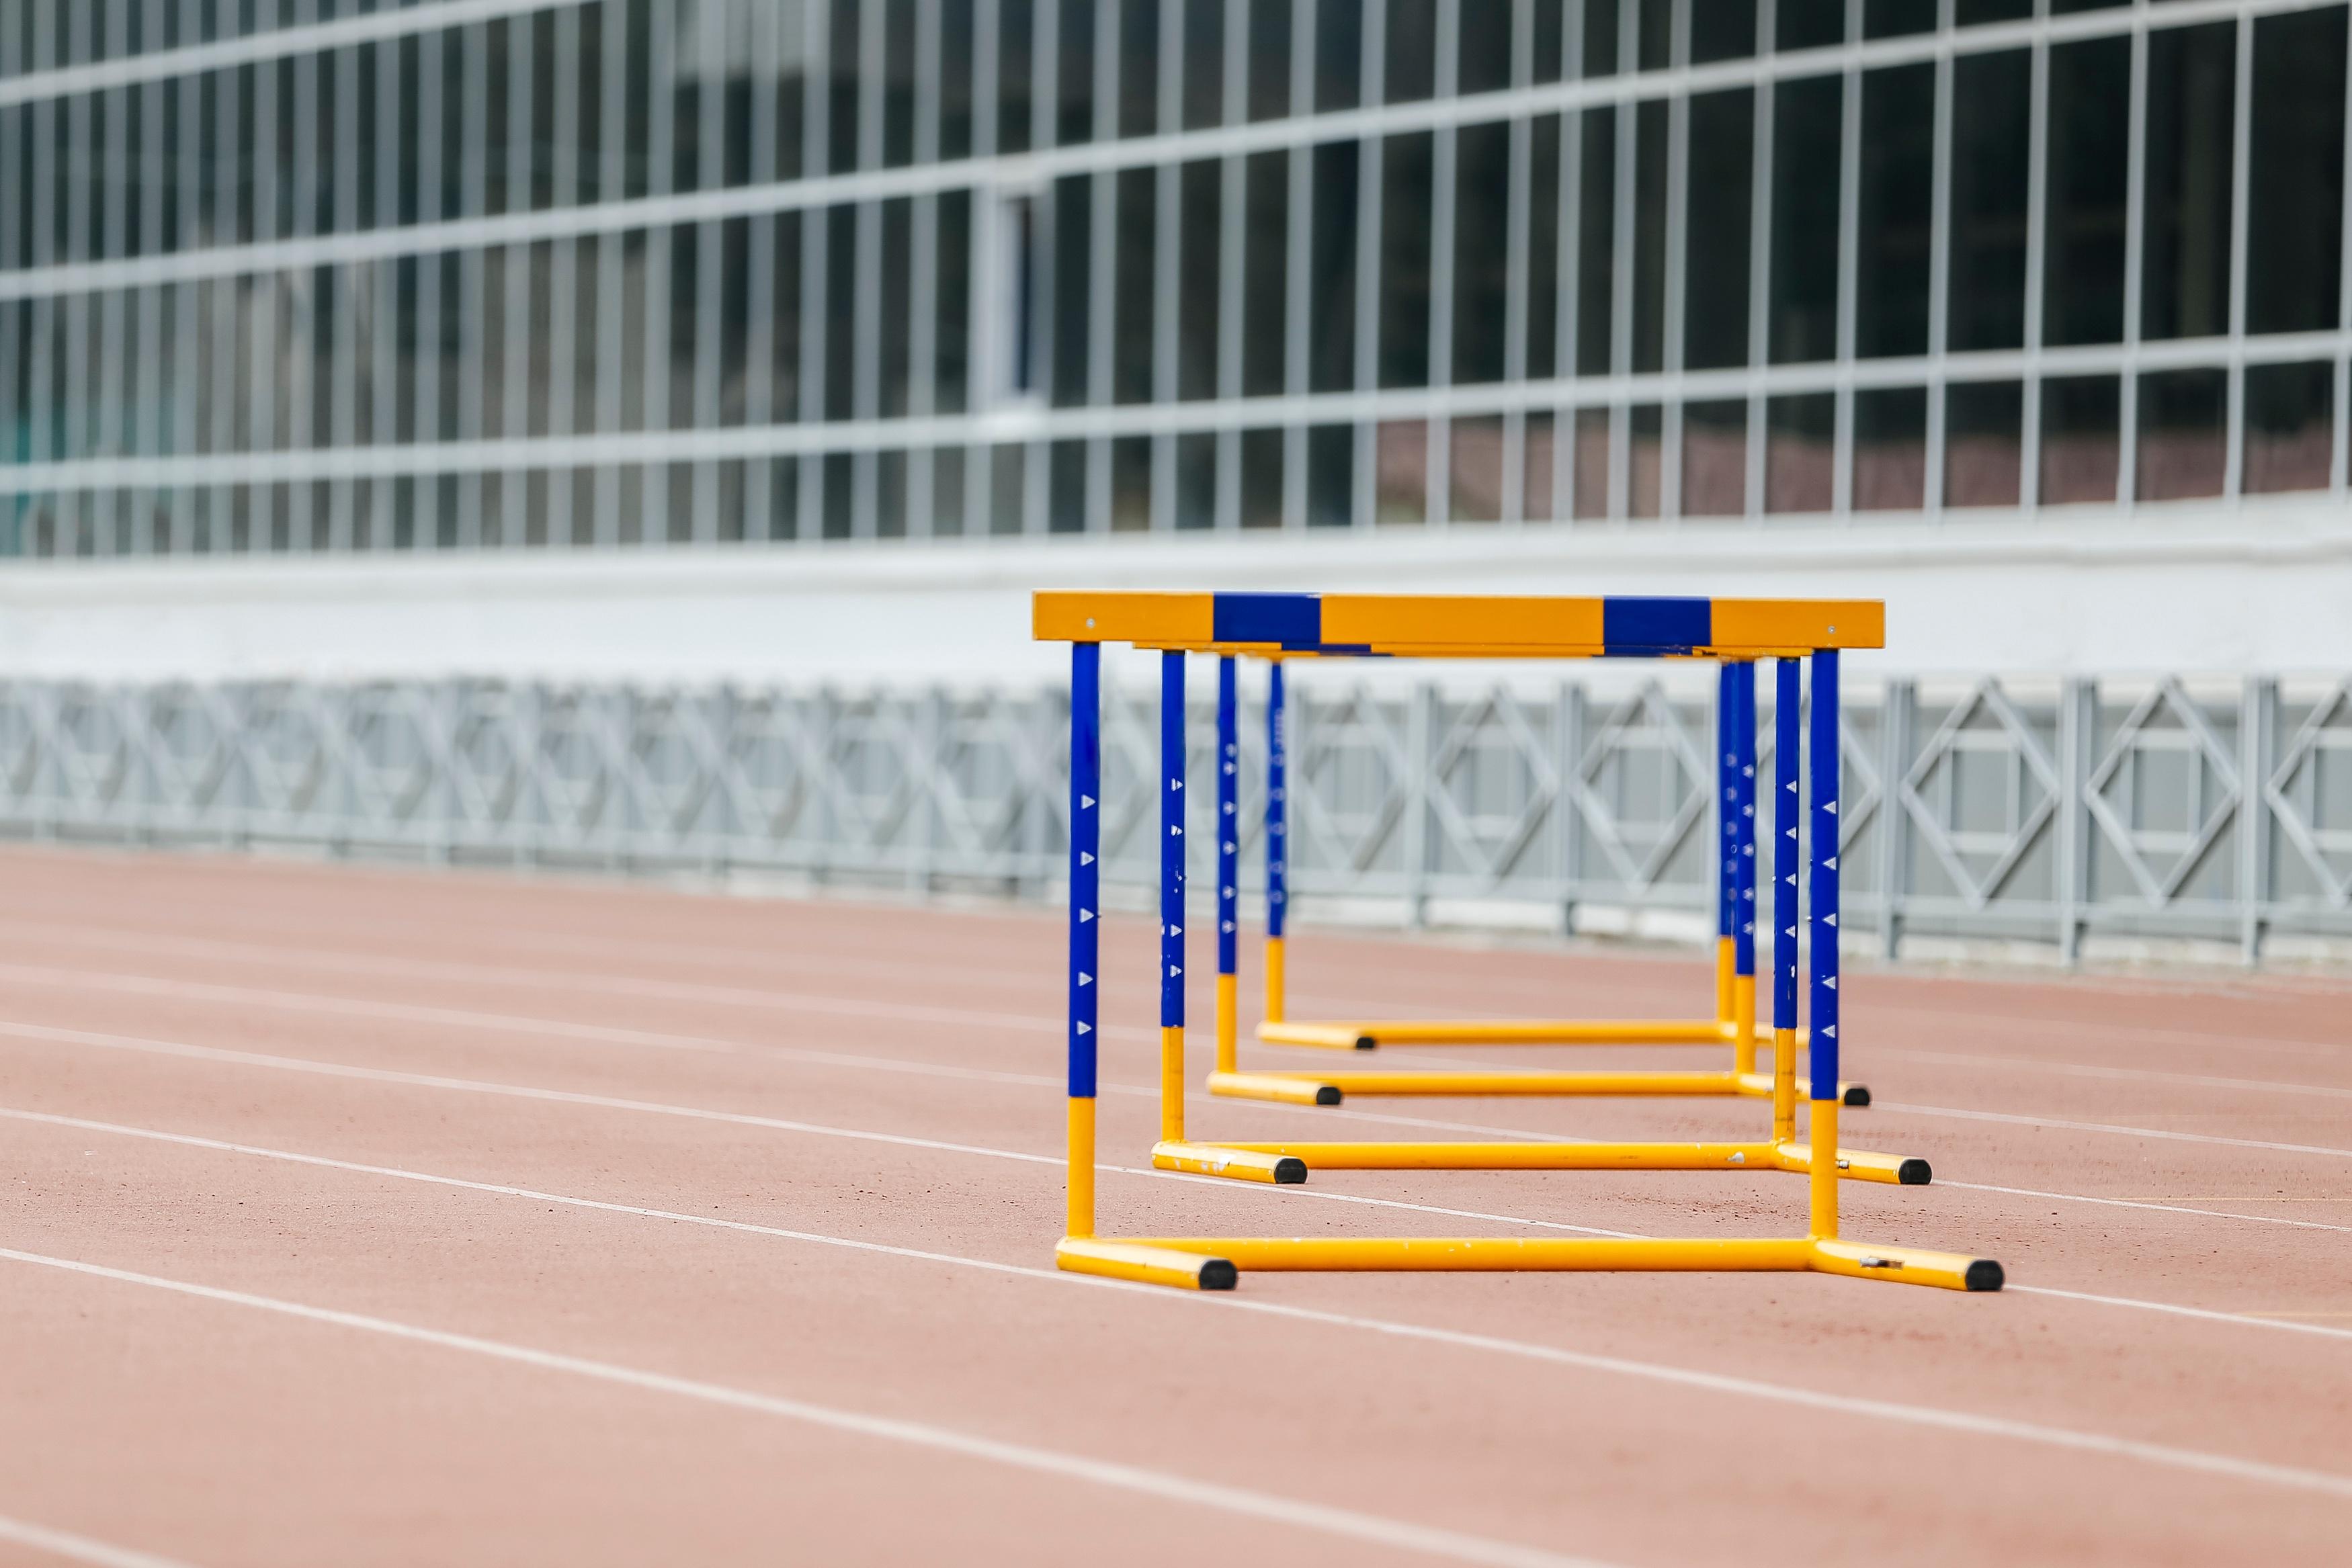 hurdles-at-stadium-P7TQA8S.jpg